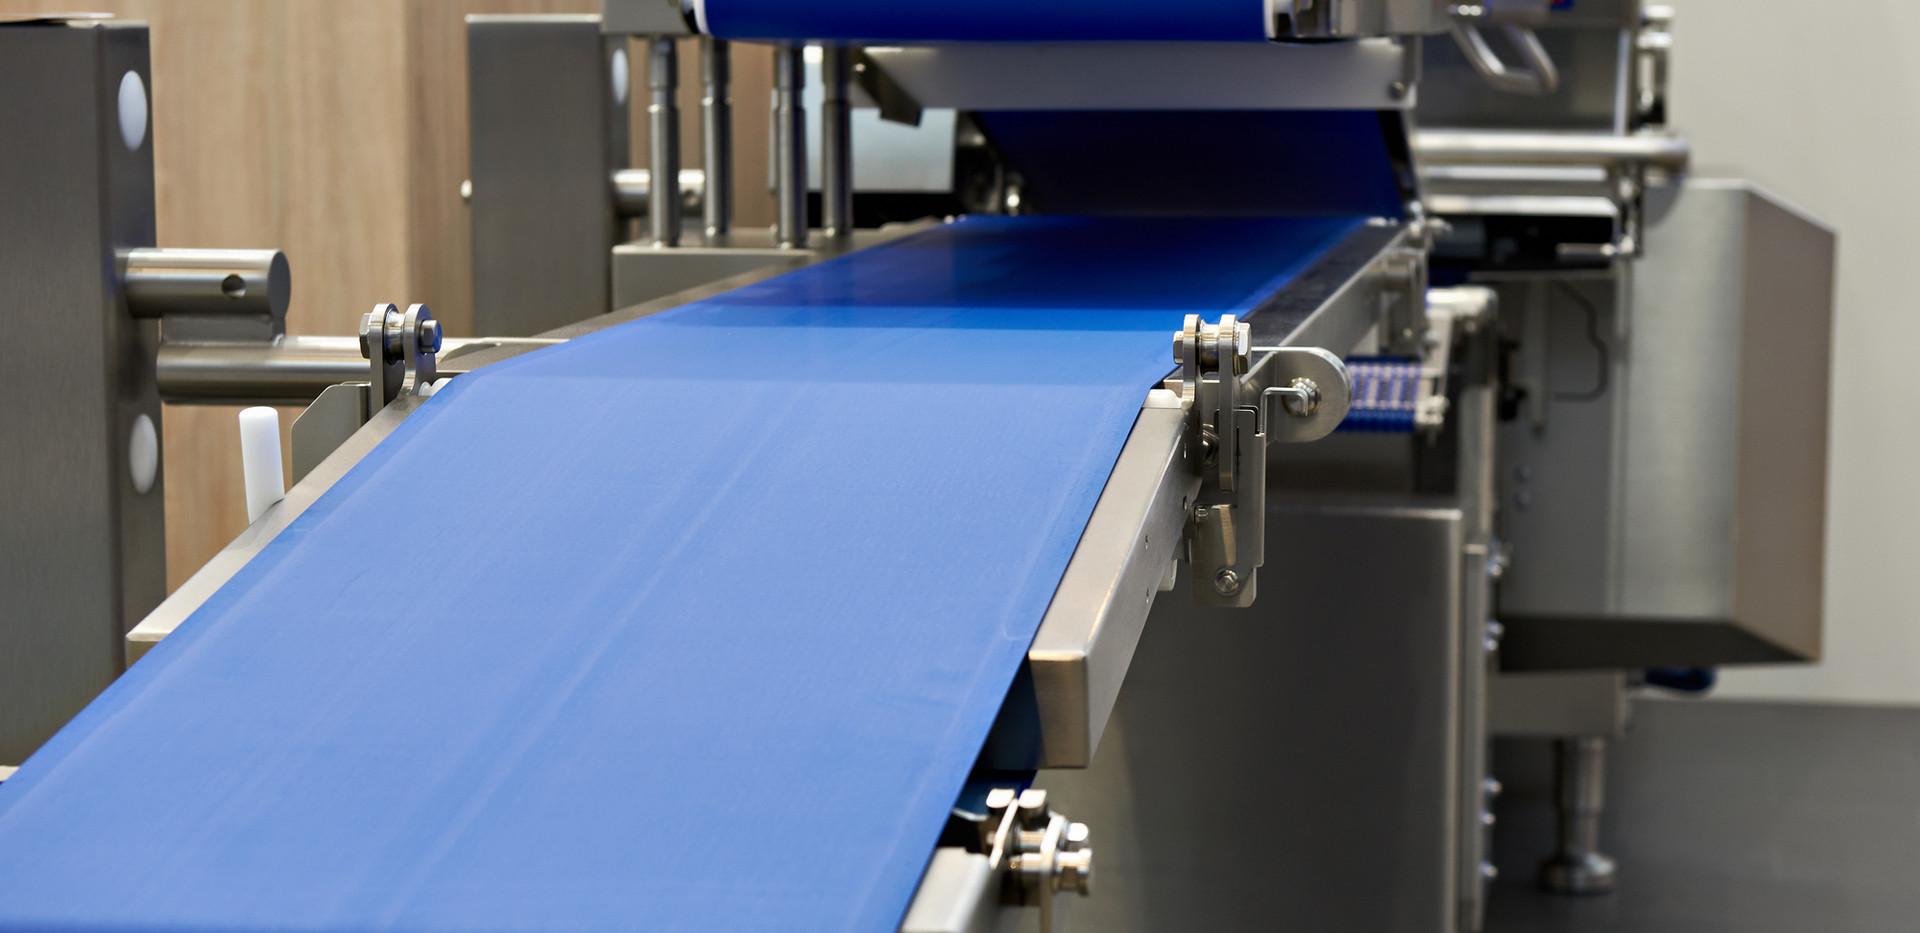 PU Conveyor Belt in Food Industry | R&D Supply Conveyor Belts